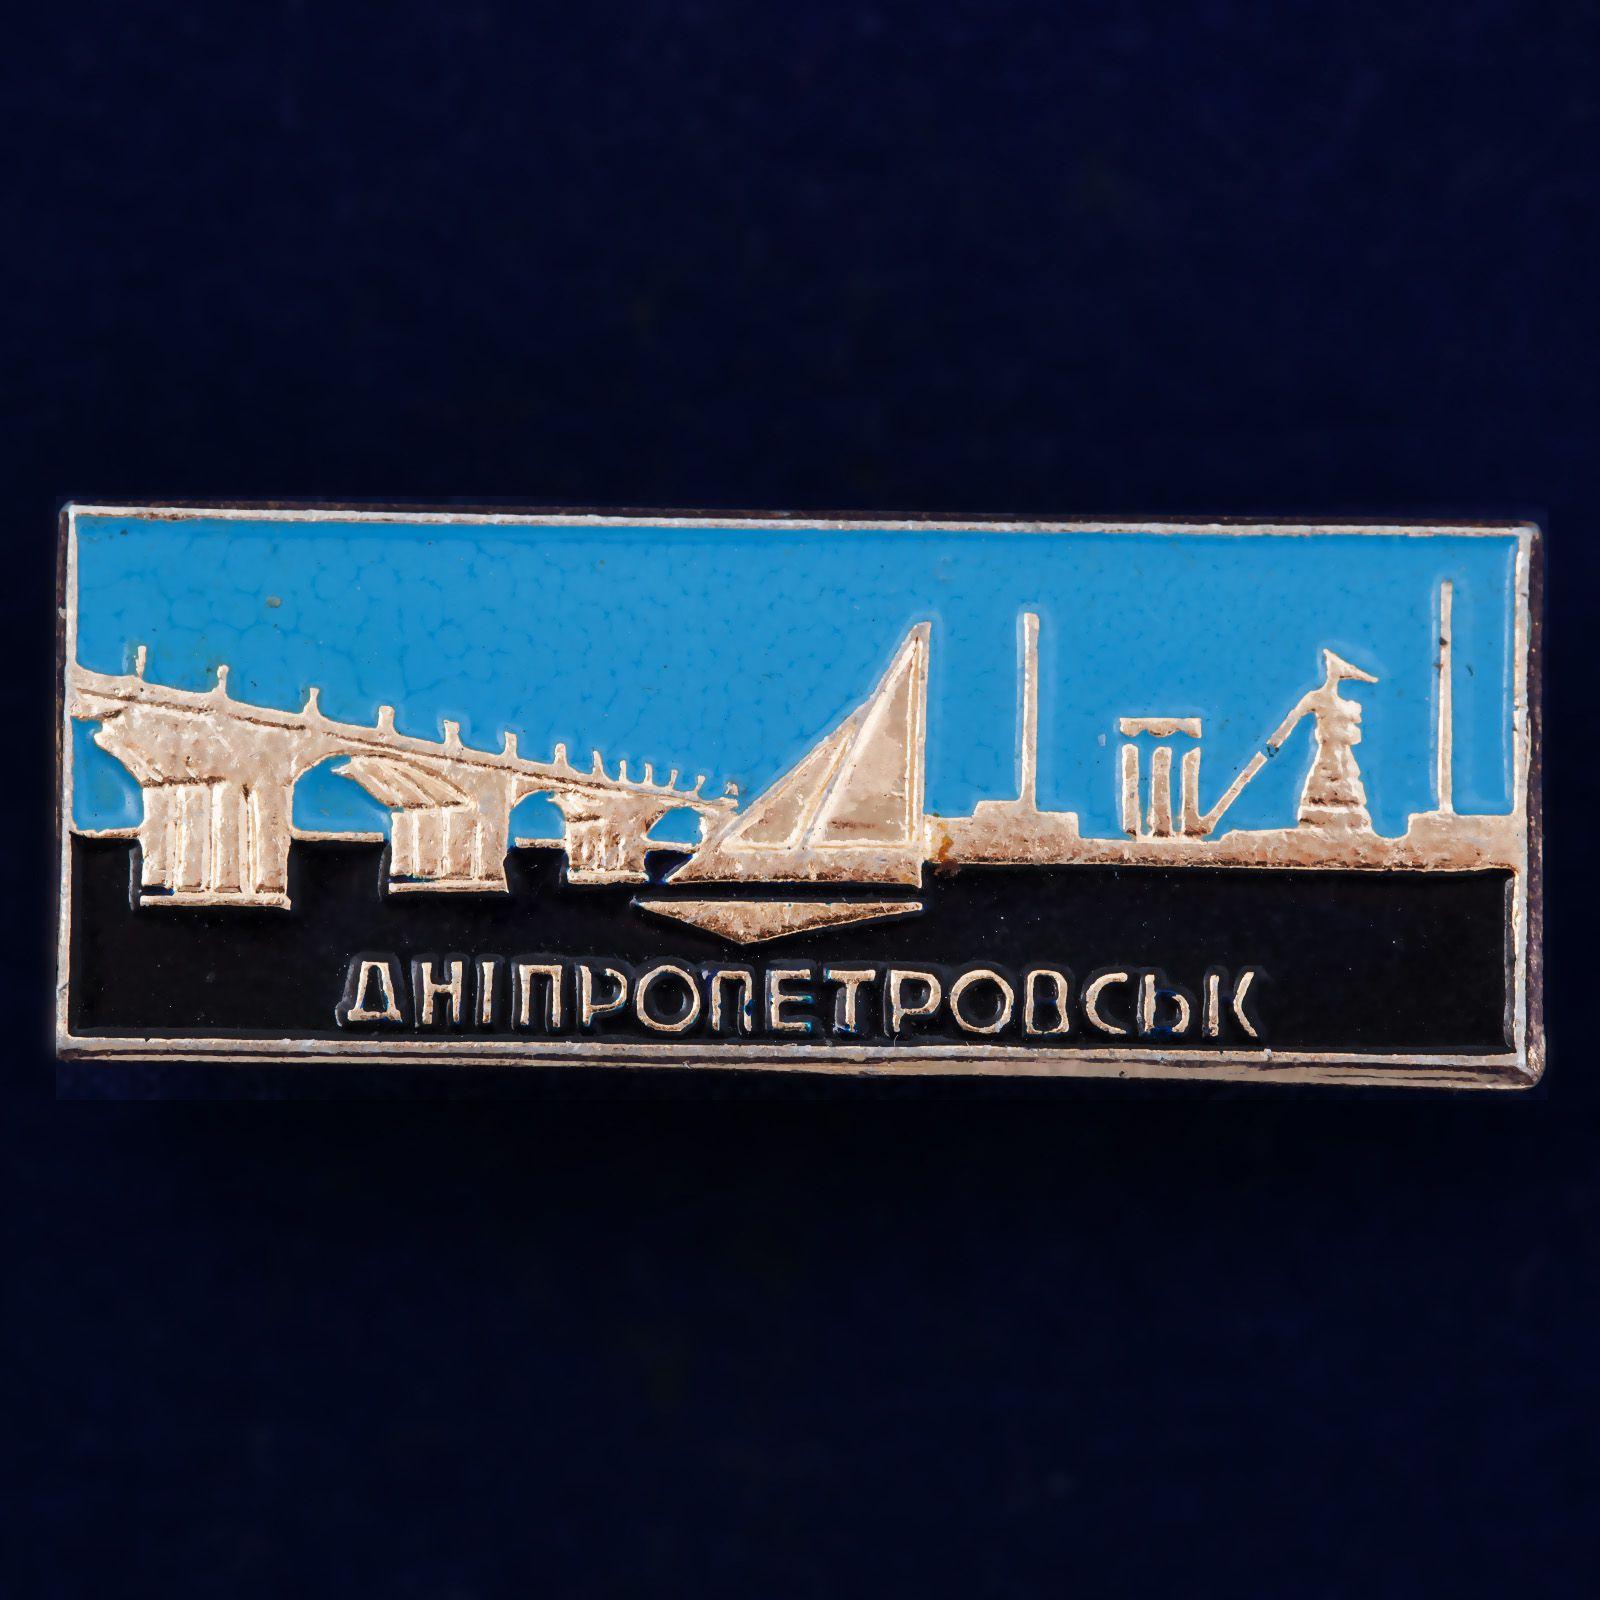 Днепропетровский значок